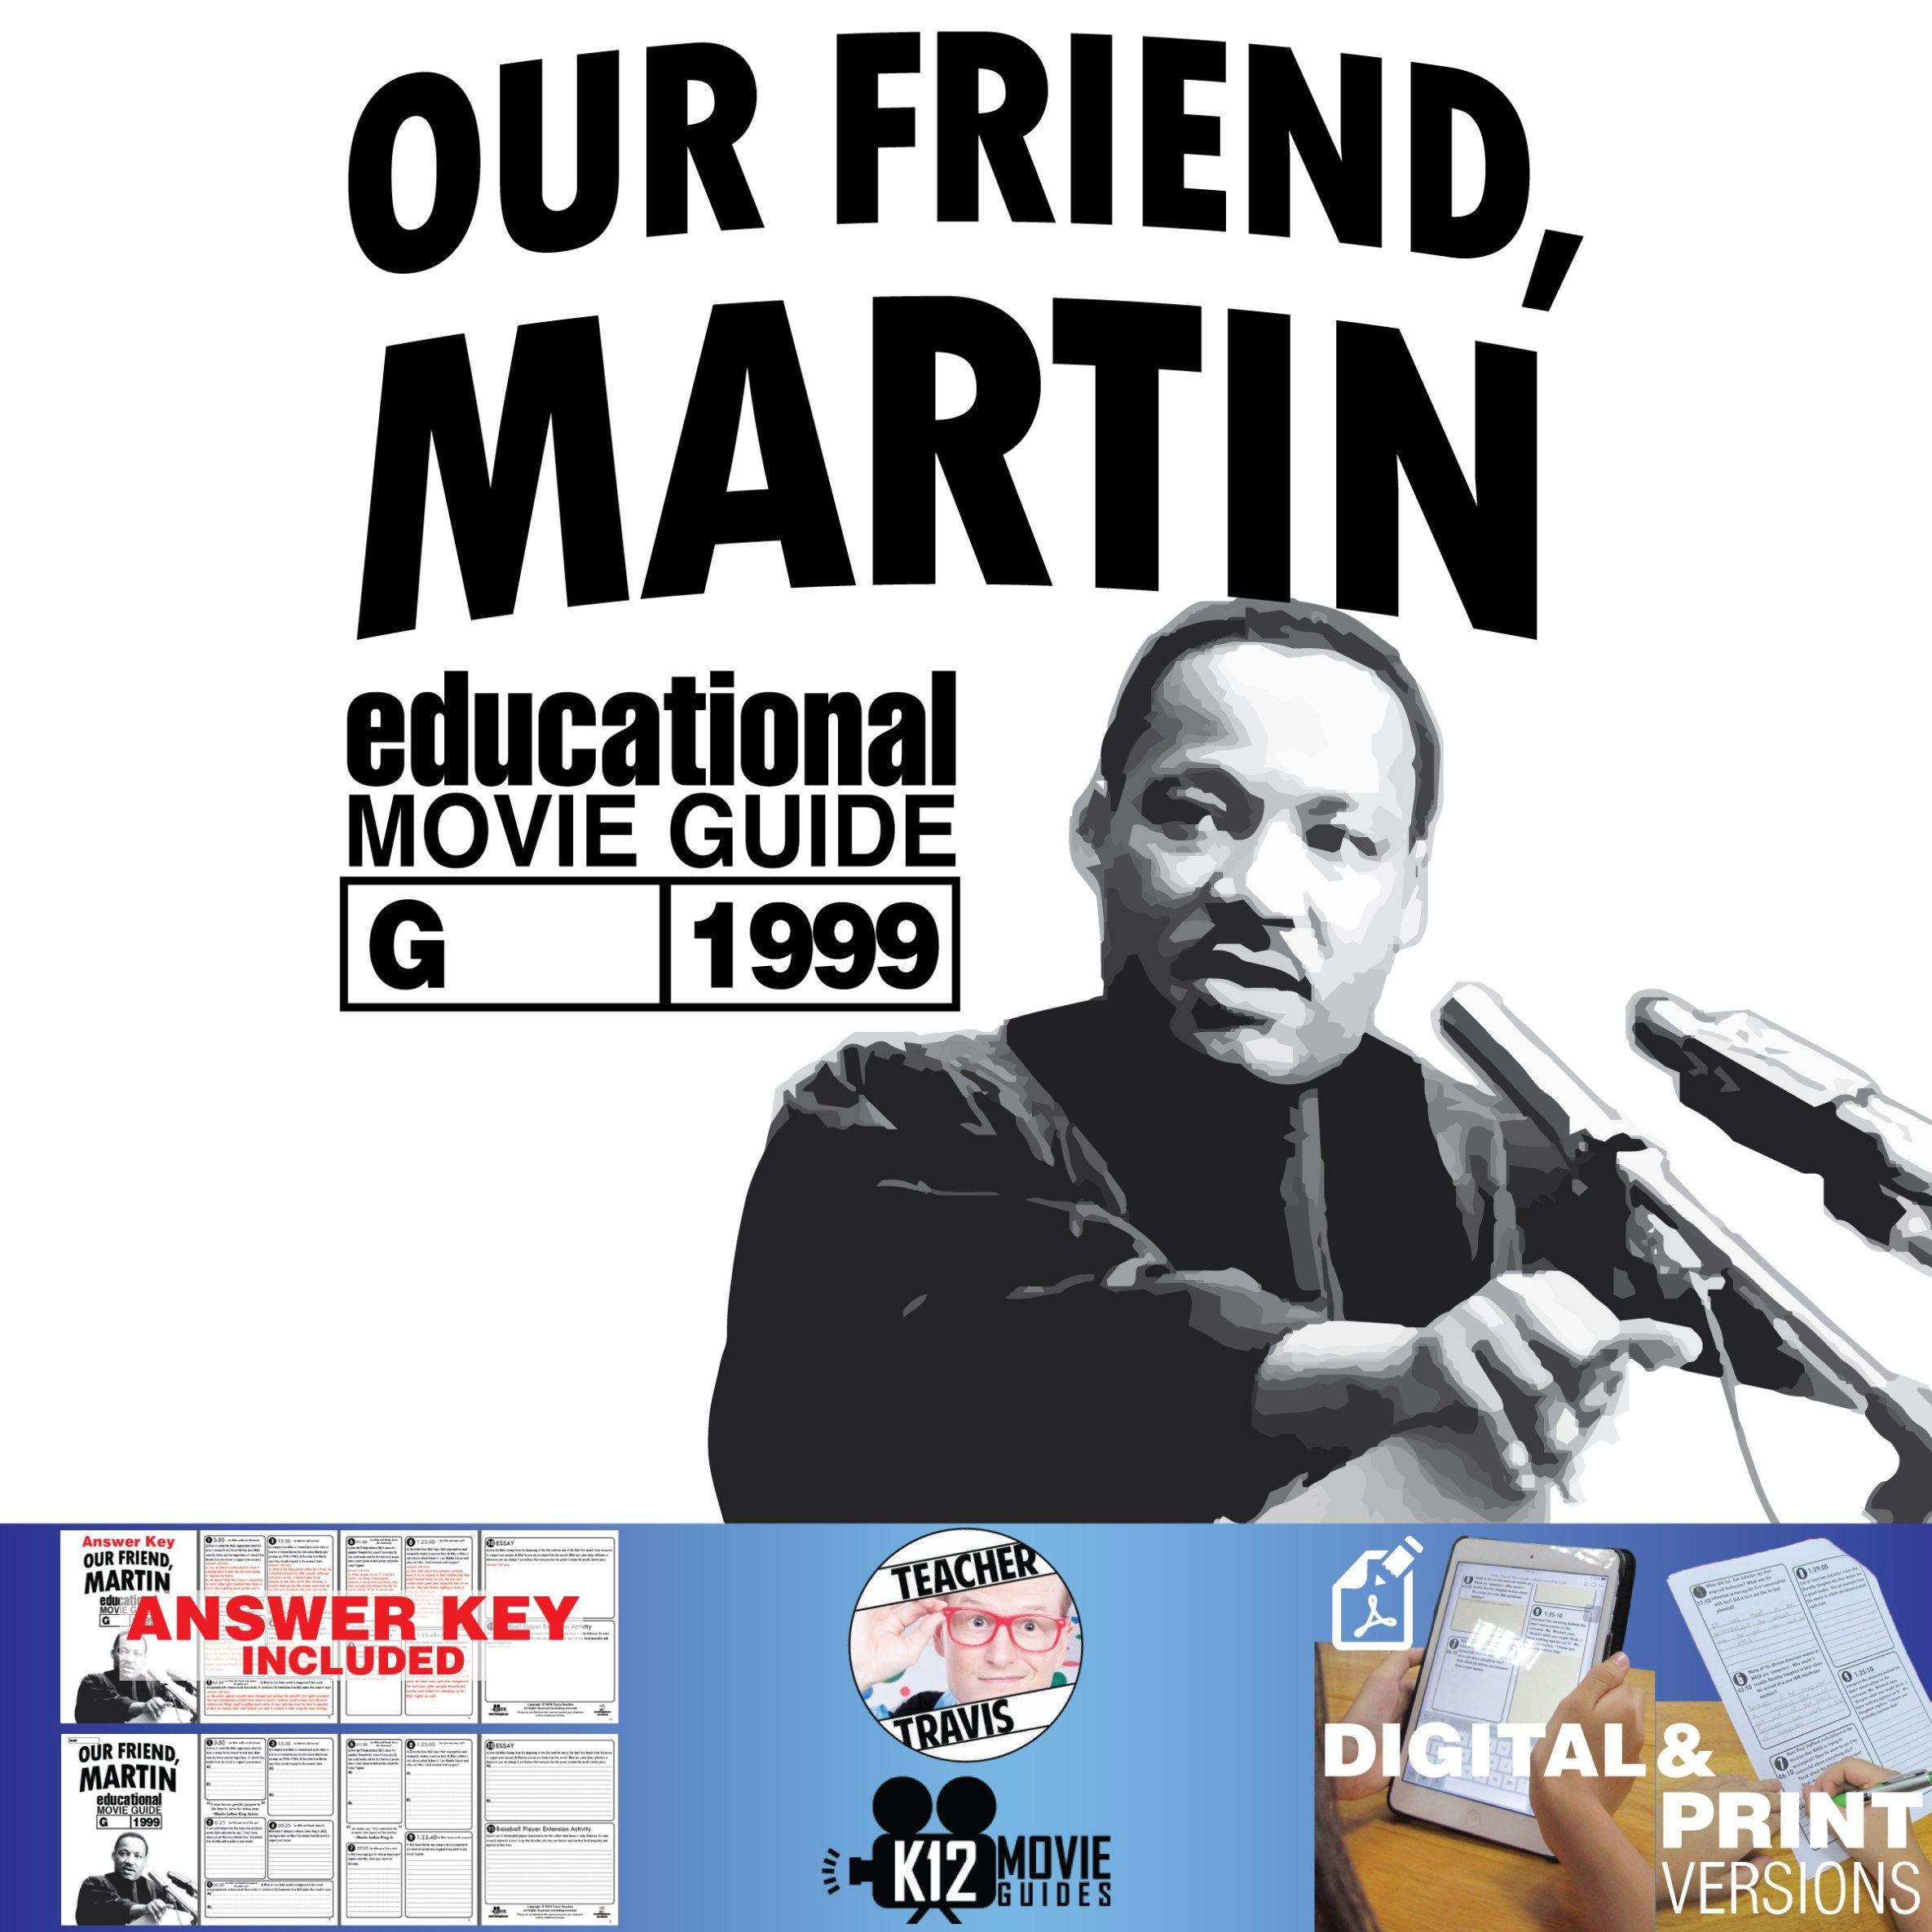 Our Friend Martin Movie Guide